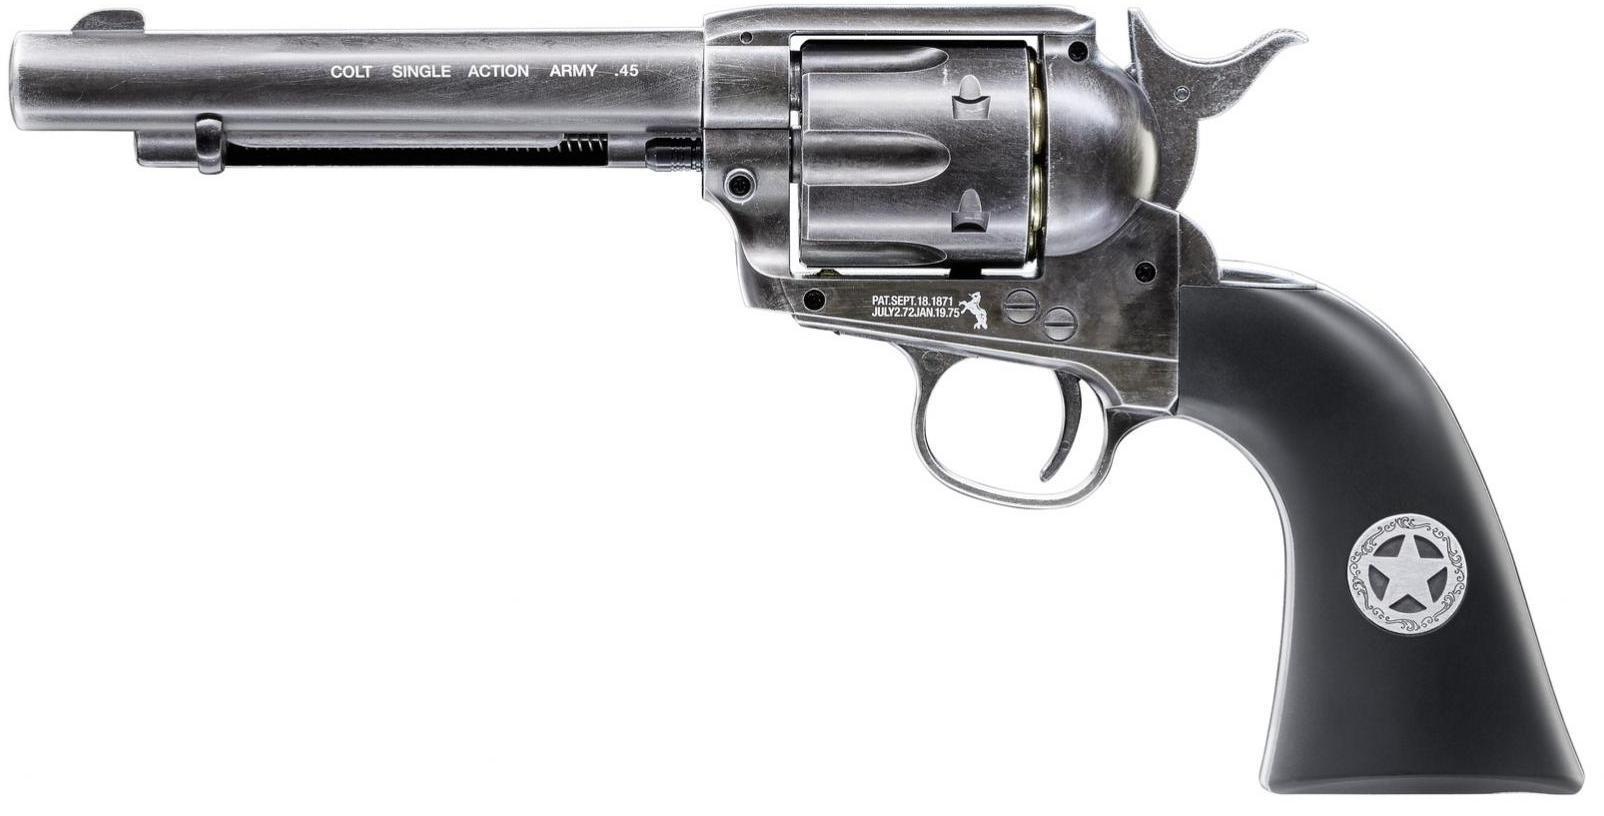 Umarex Saa 45 Colt Peacemaker 5 5 Quot Ranger Edition 4 5mm